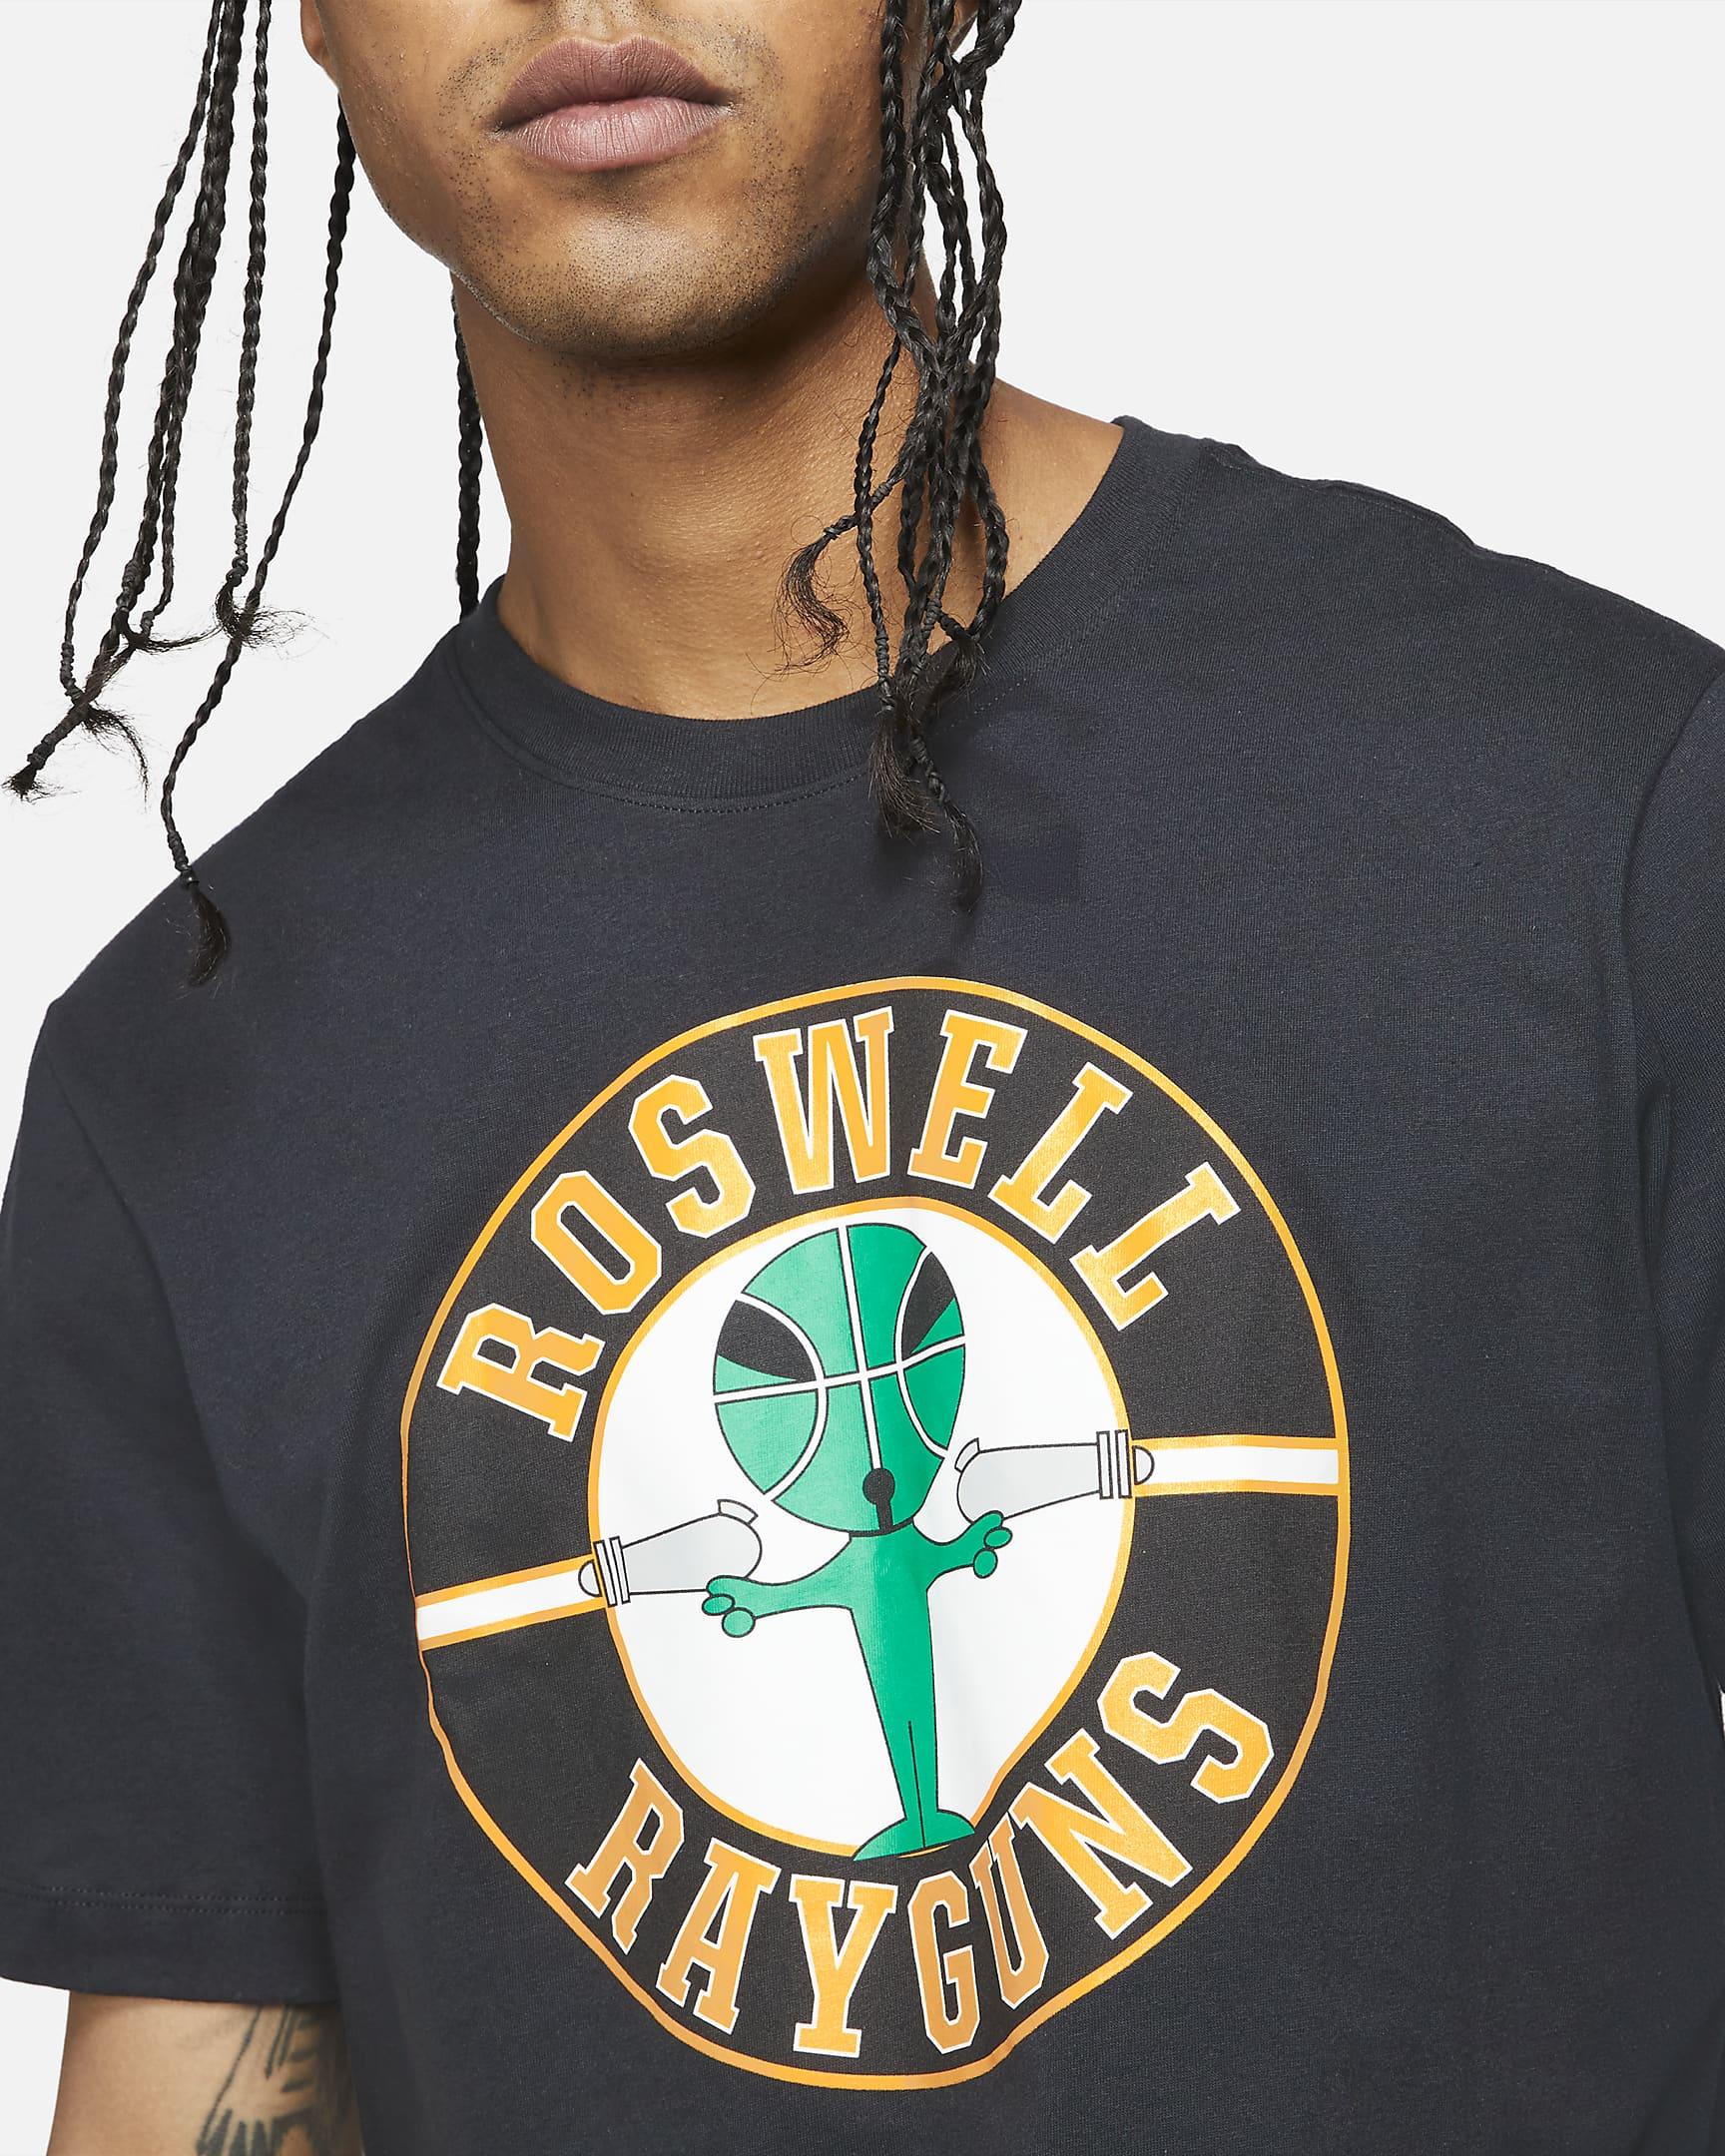 rayguns-mens-basketball-t-shirt-kgKBwR-6